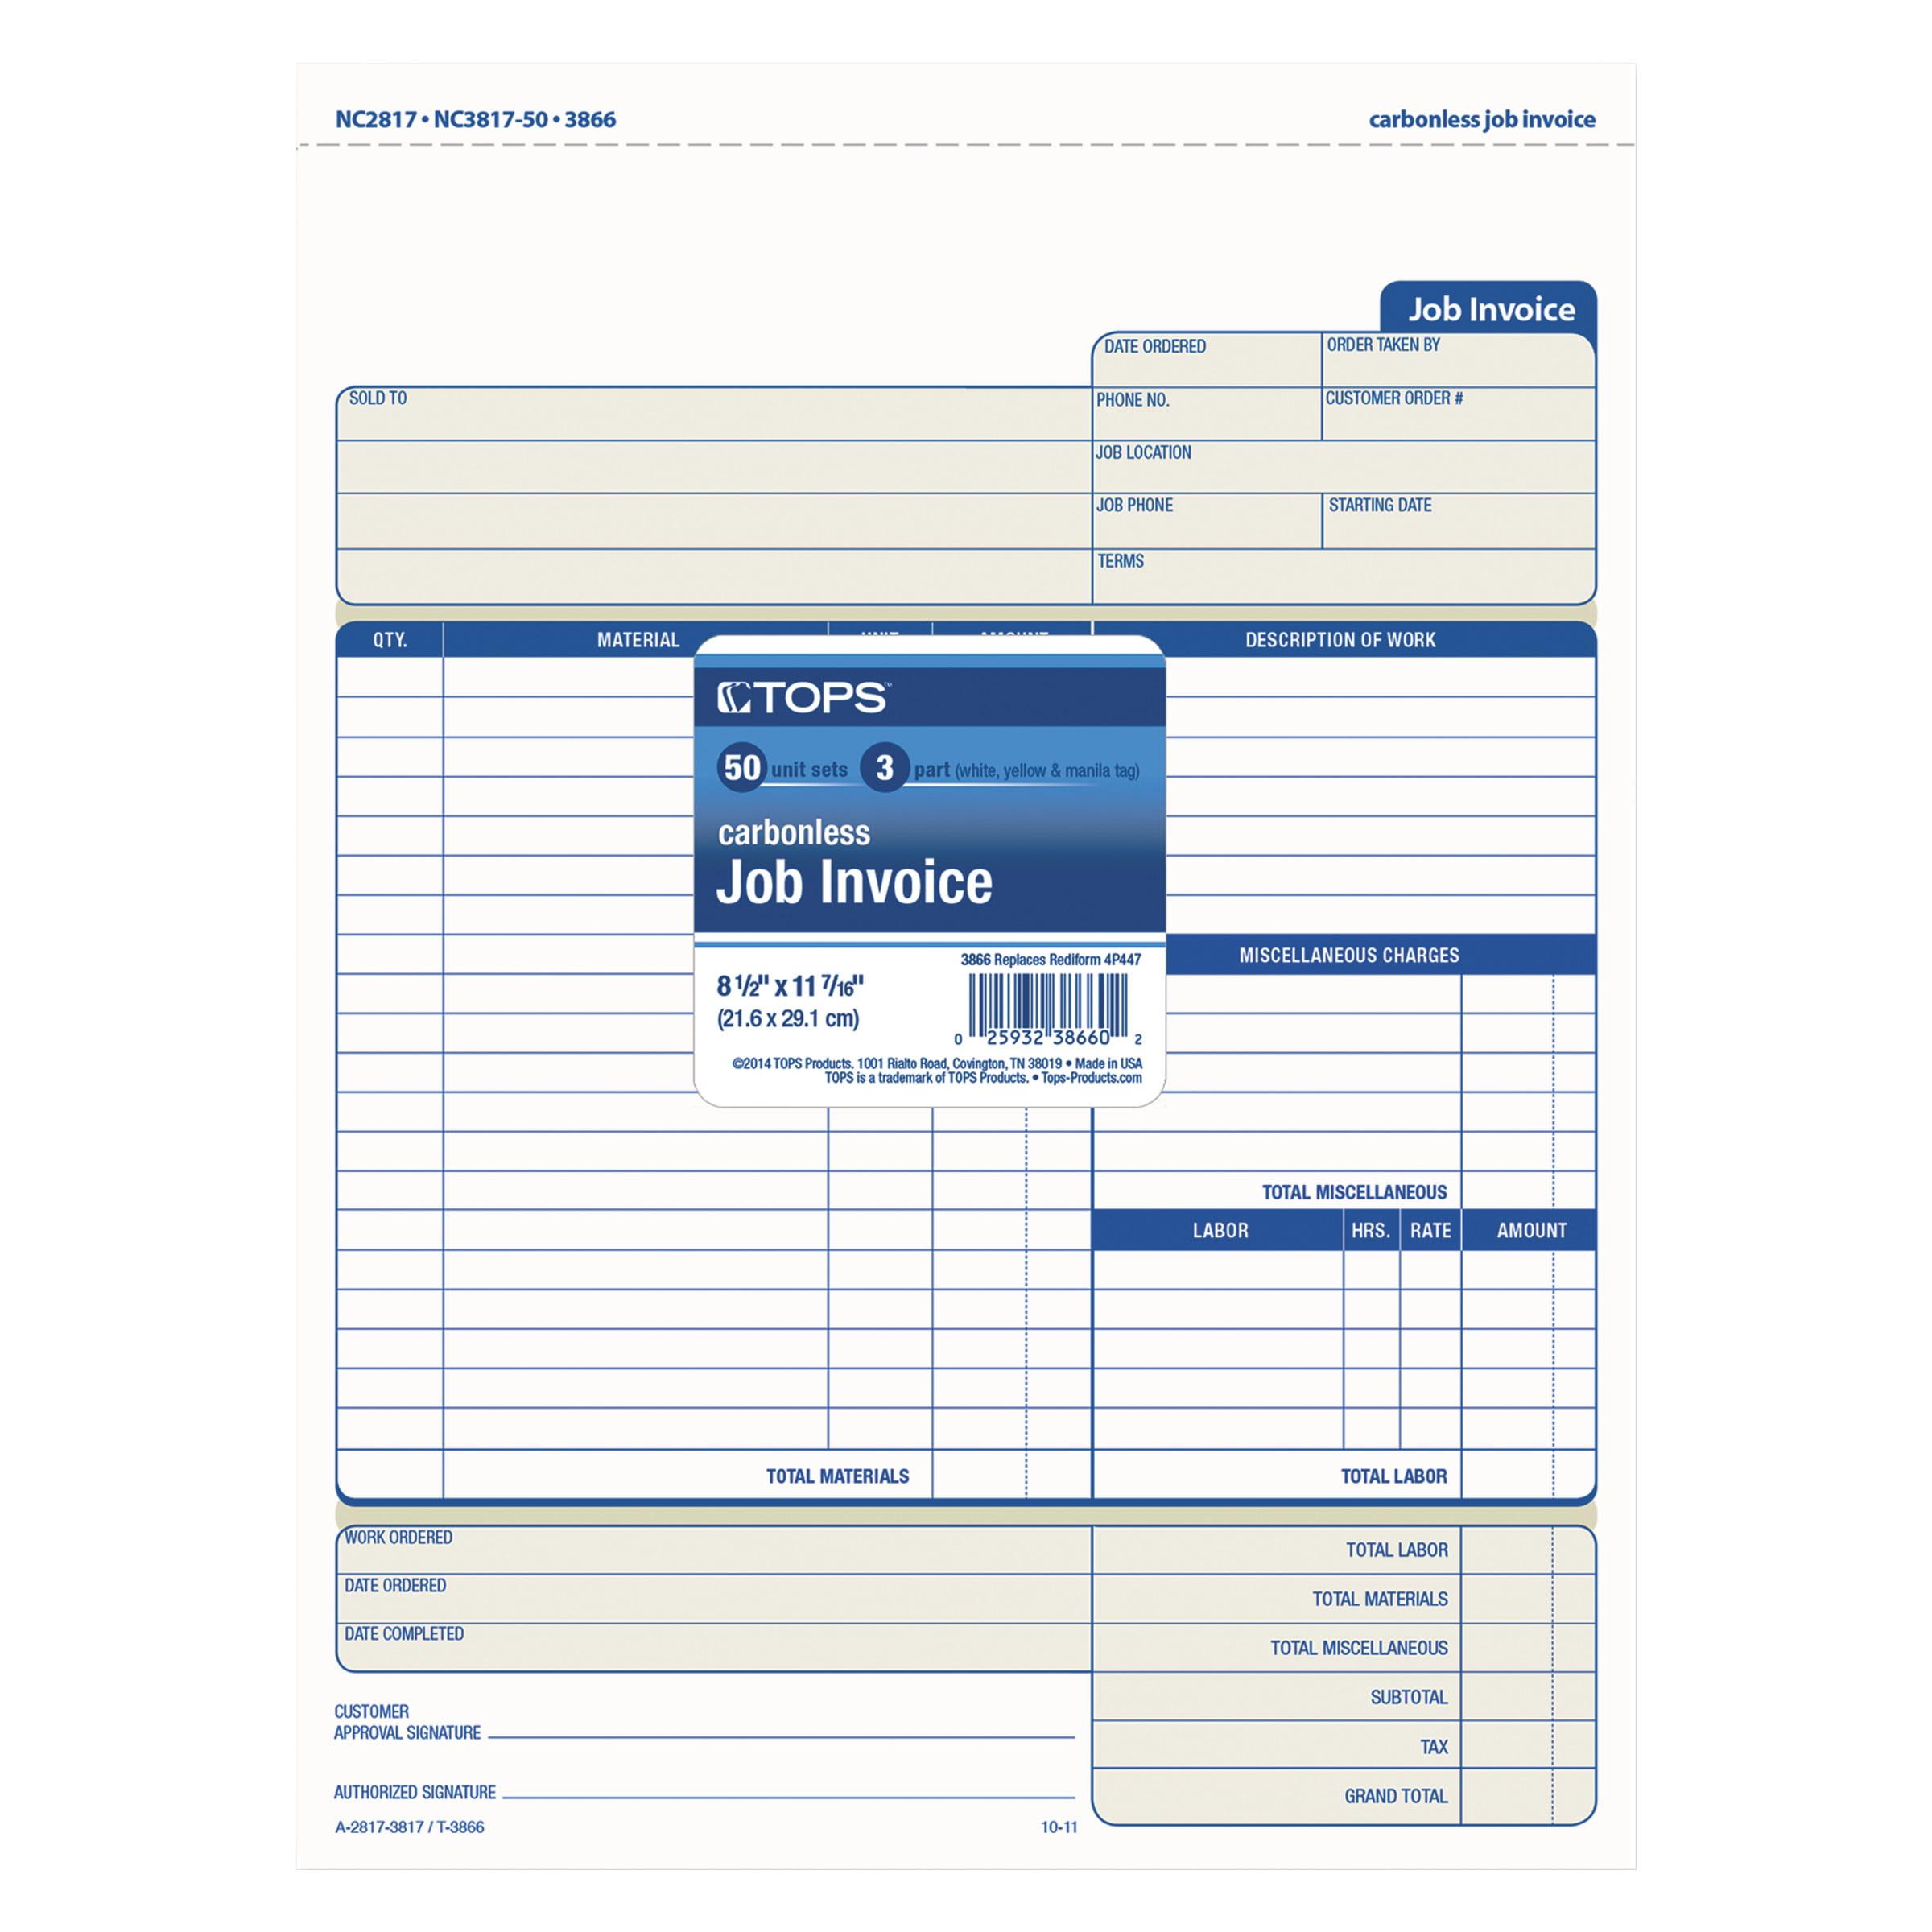 Tenant Receipt Excel Tops Snapoff Job Invoice Form  X  Part Carbonless  Receipt Pronunciation Audio Excel with Billing Invoice Pdf Tops Snapoff Job Invoice Form  X  Part Carbonless  Forms   Walmartcom Php Invoice Software